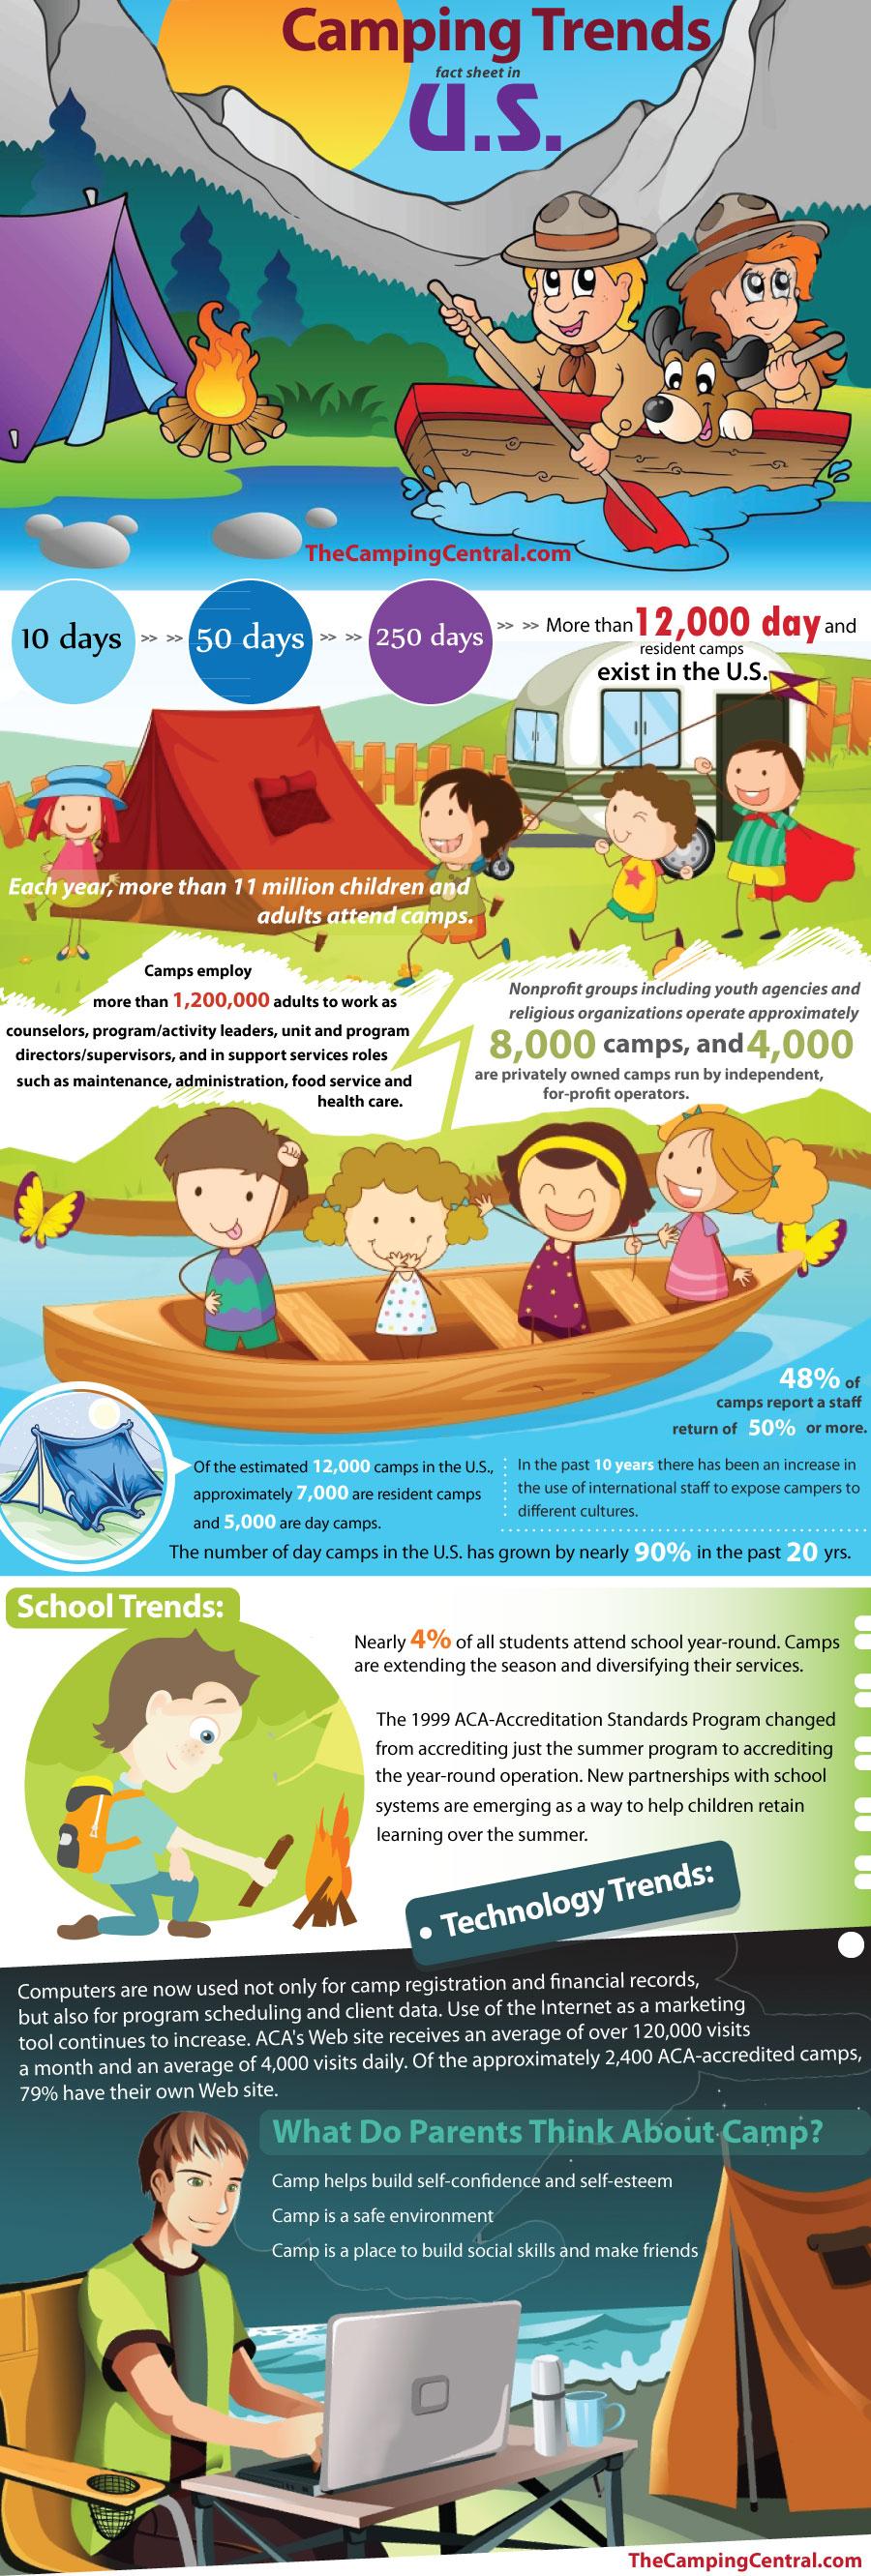 Camping Trends Fact Sheet in U.S.